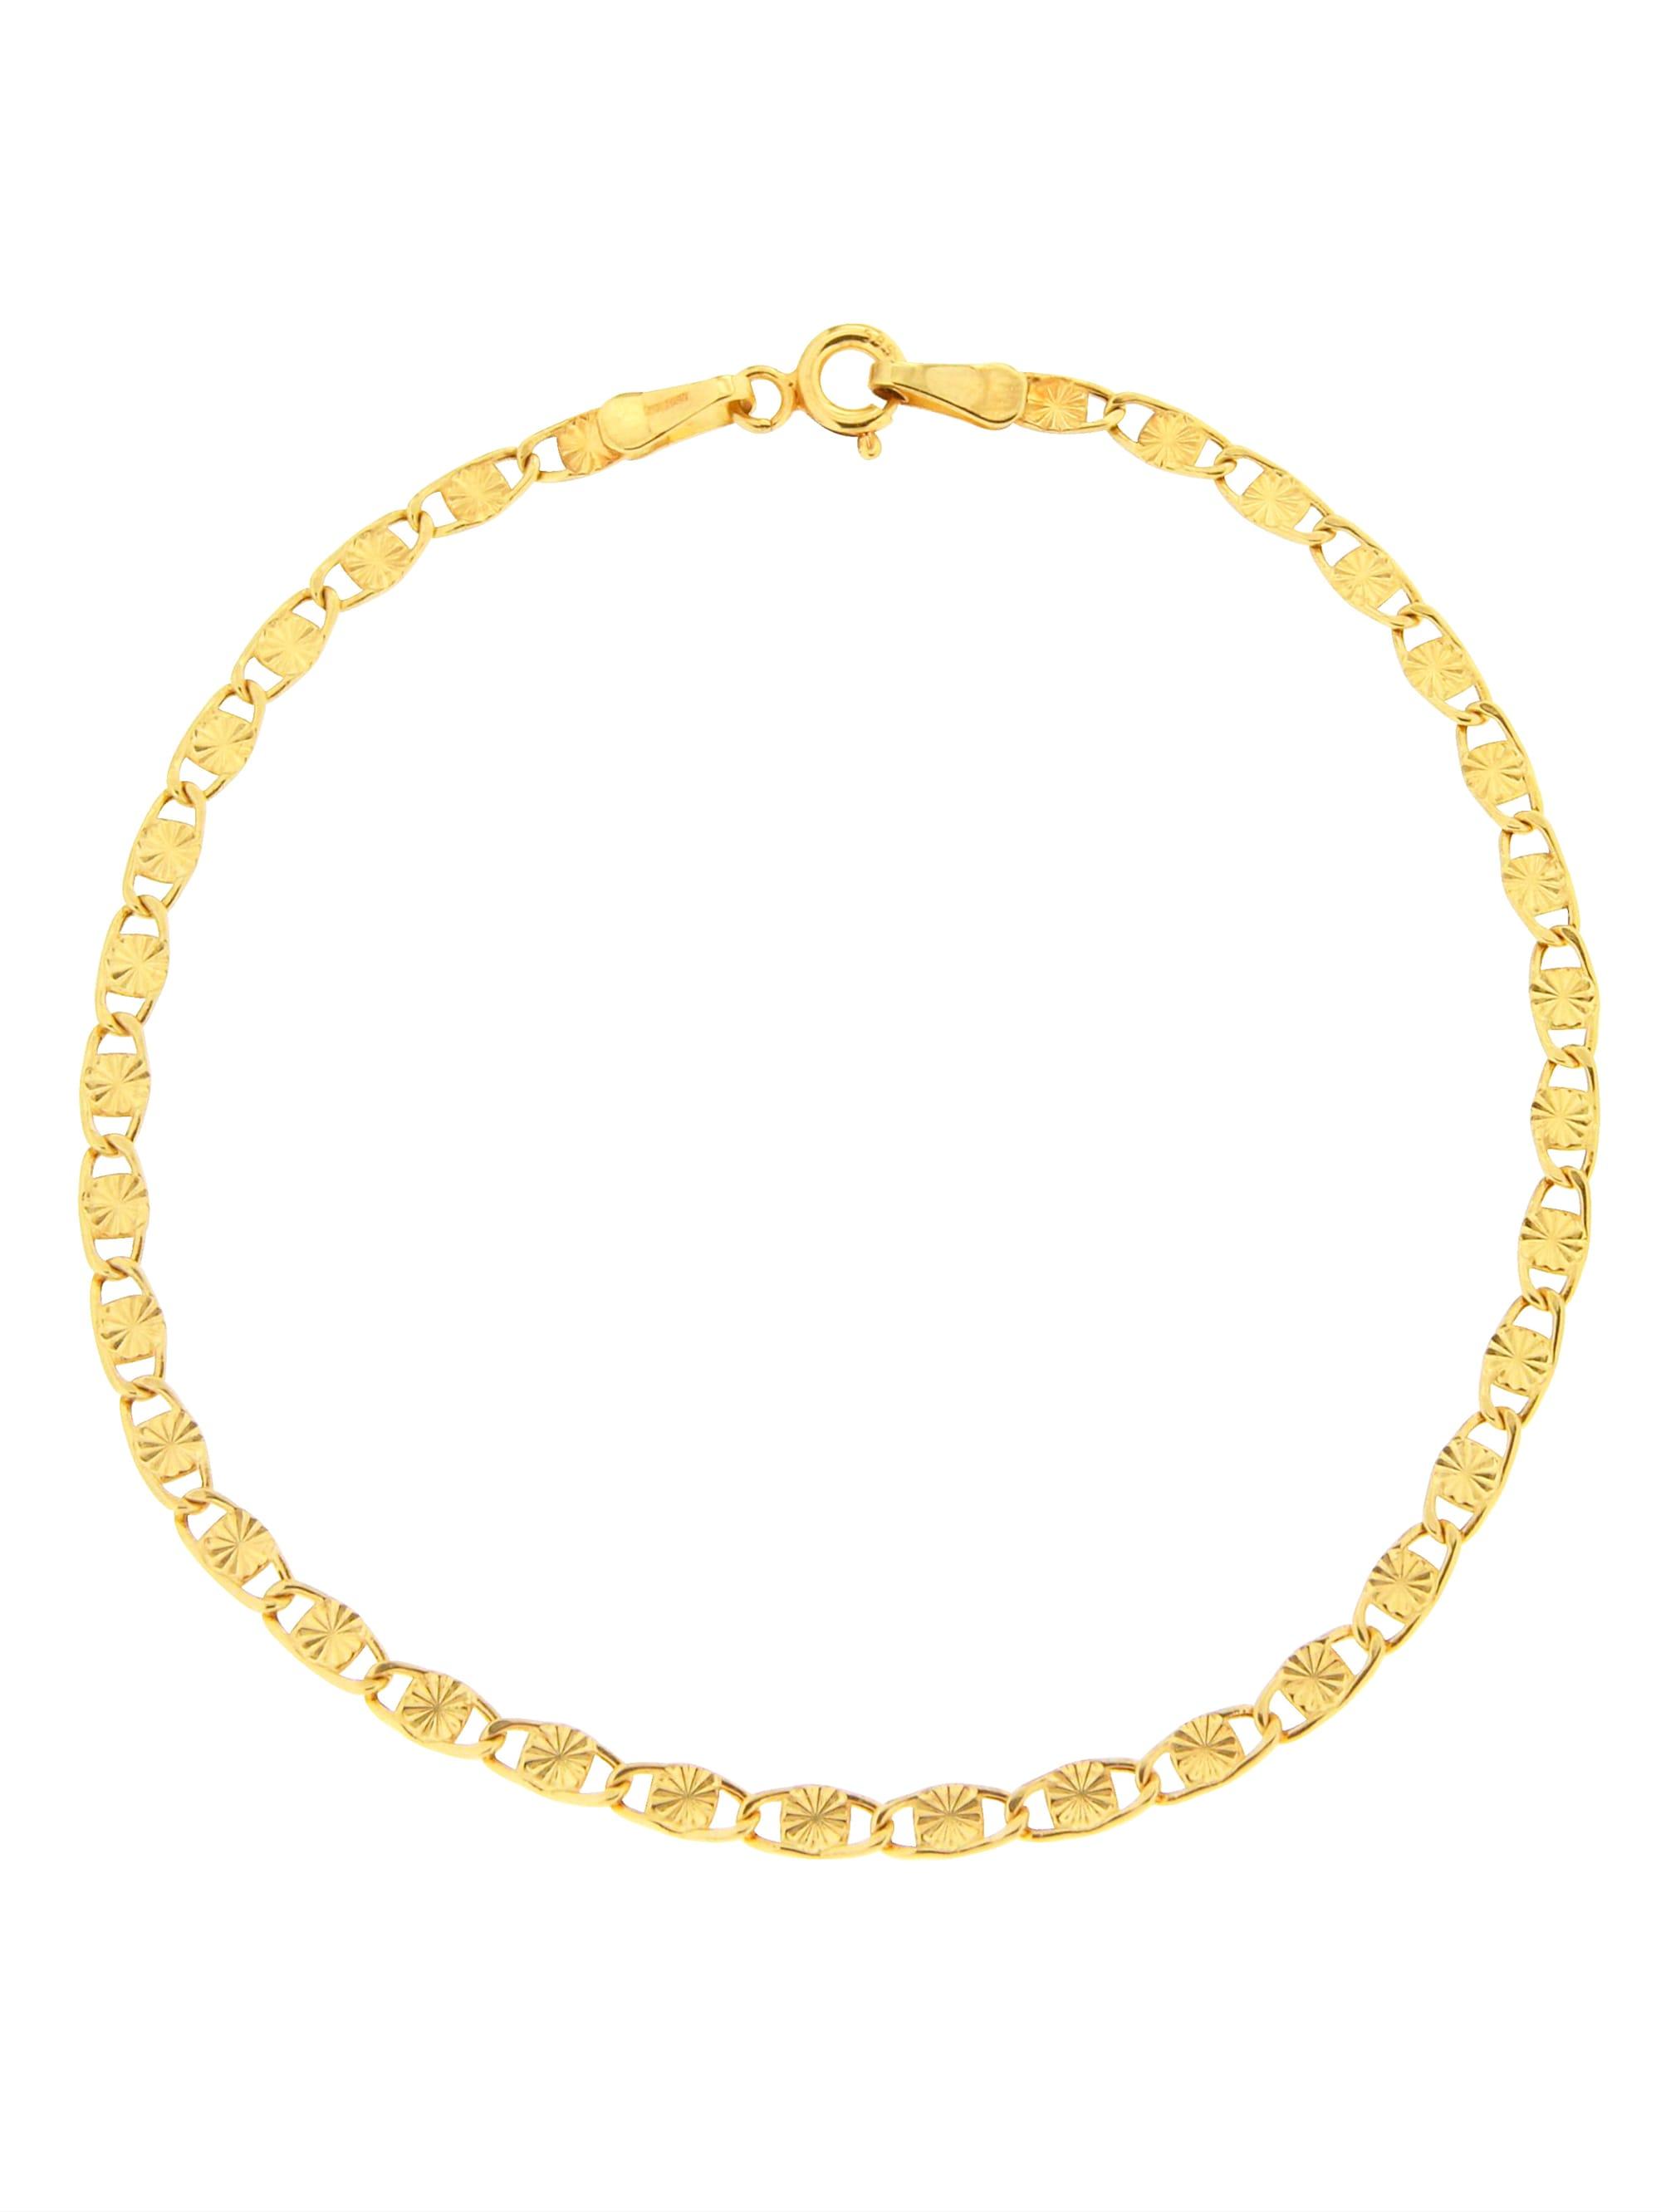 Grazielli Armband in Gelbgold 375 4gqsM